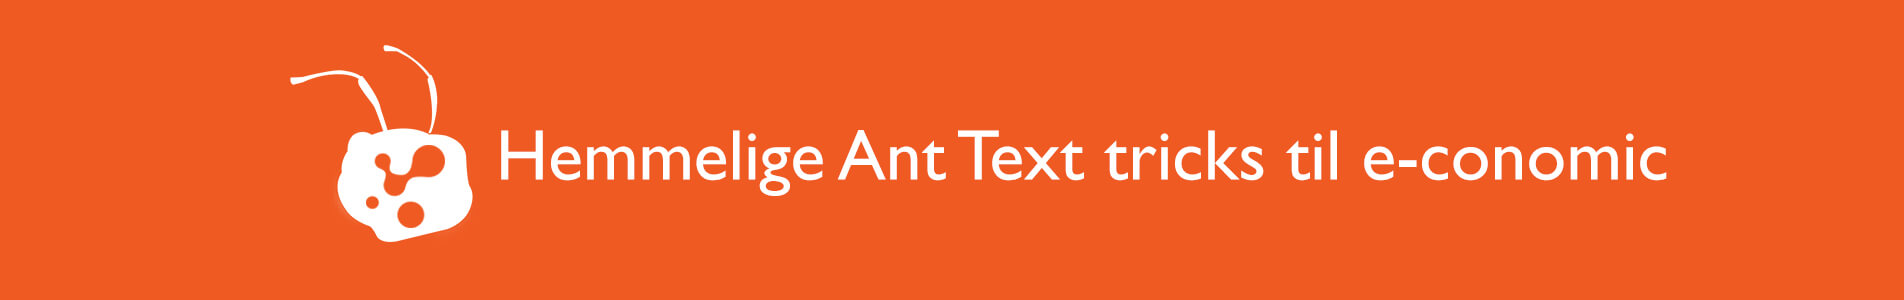 header ant text tips til economics